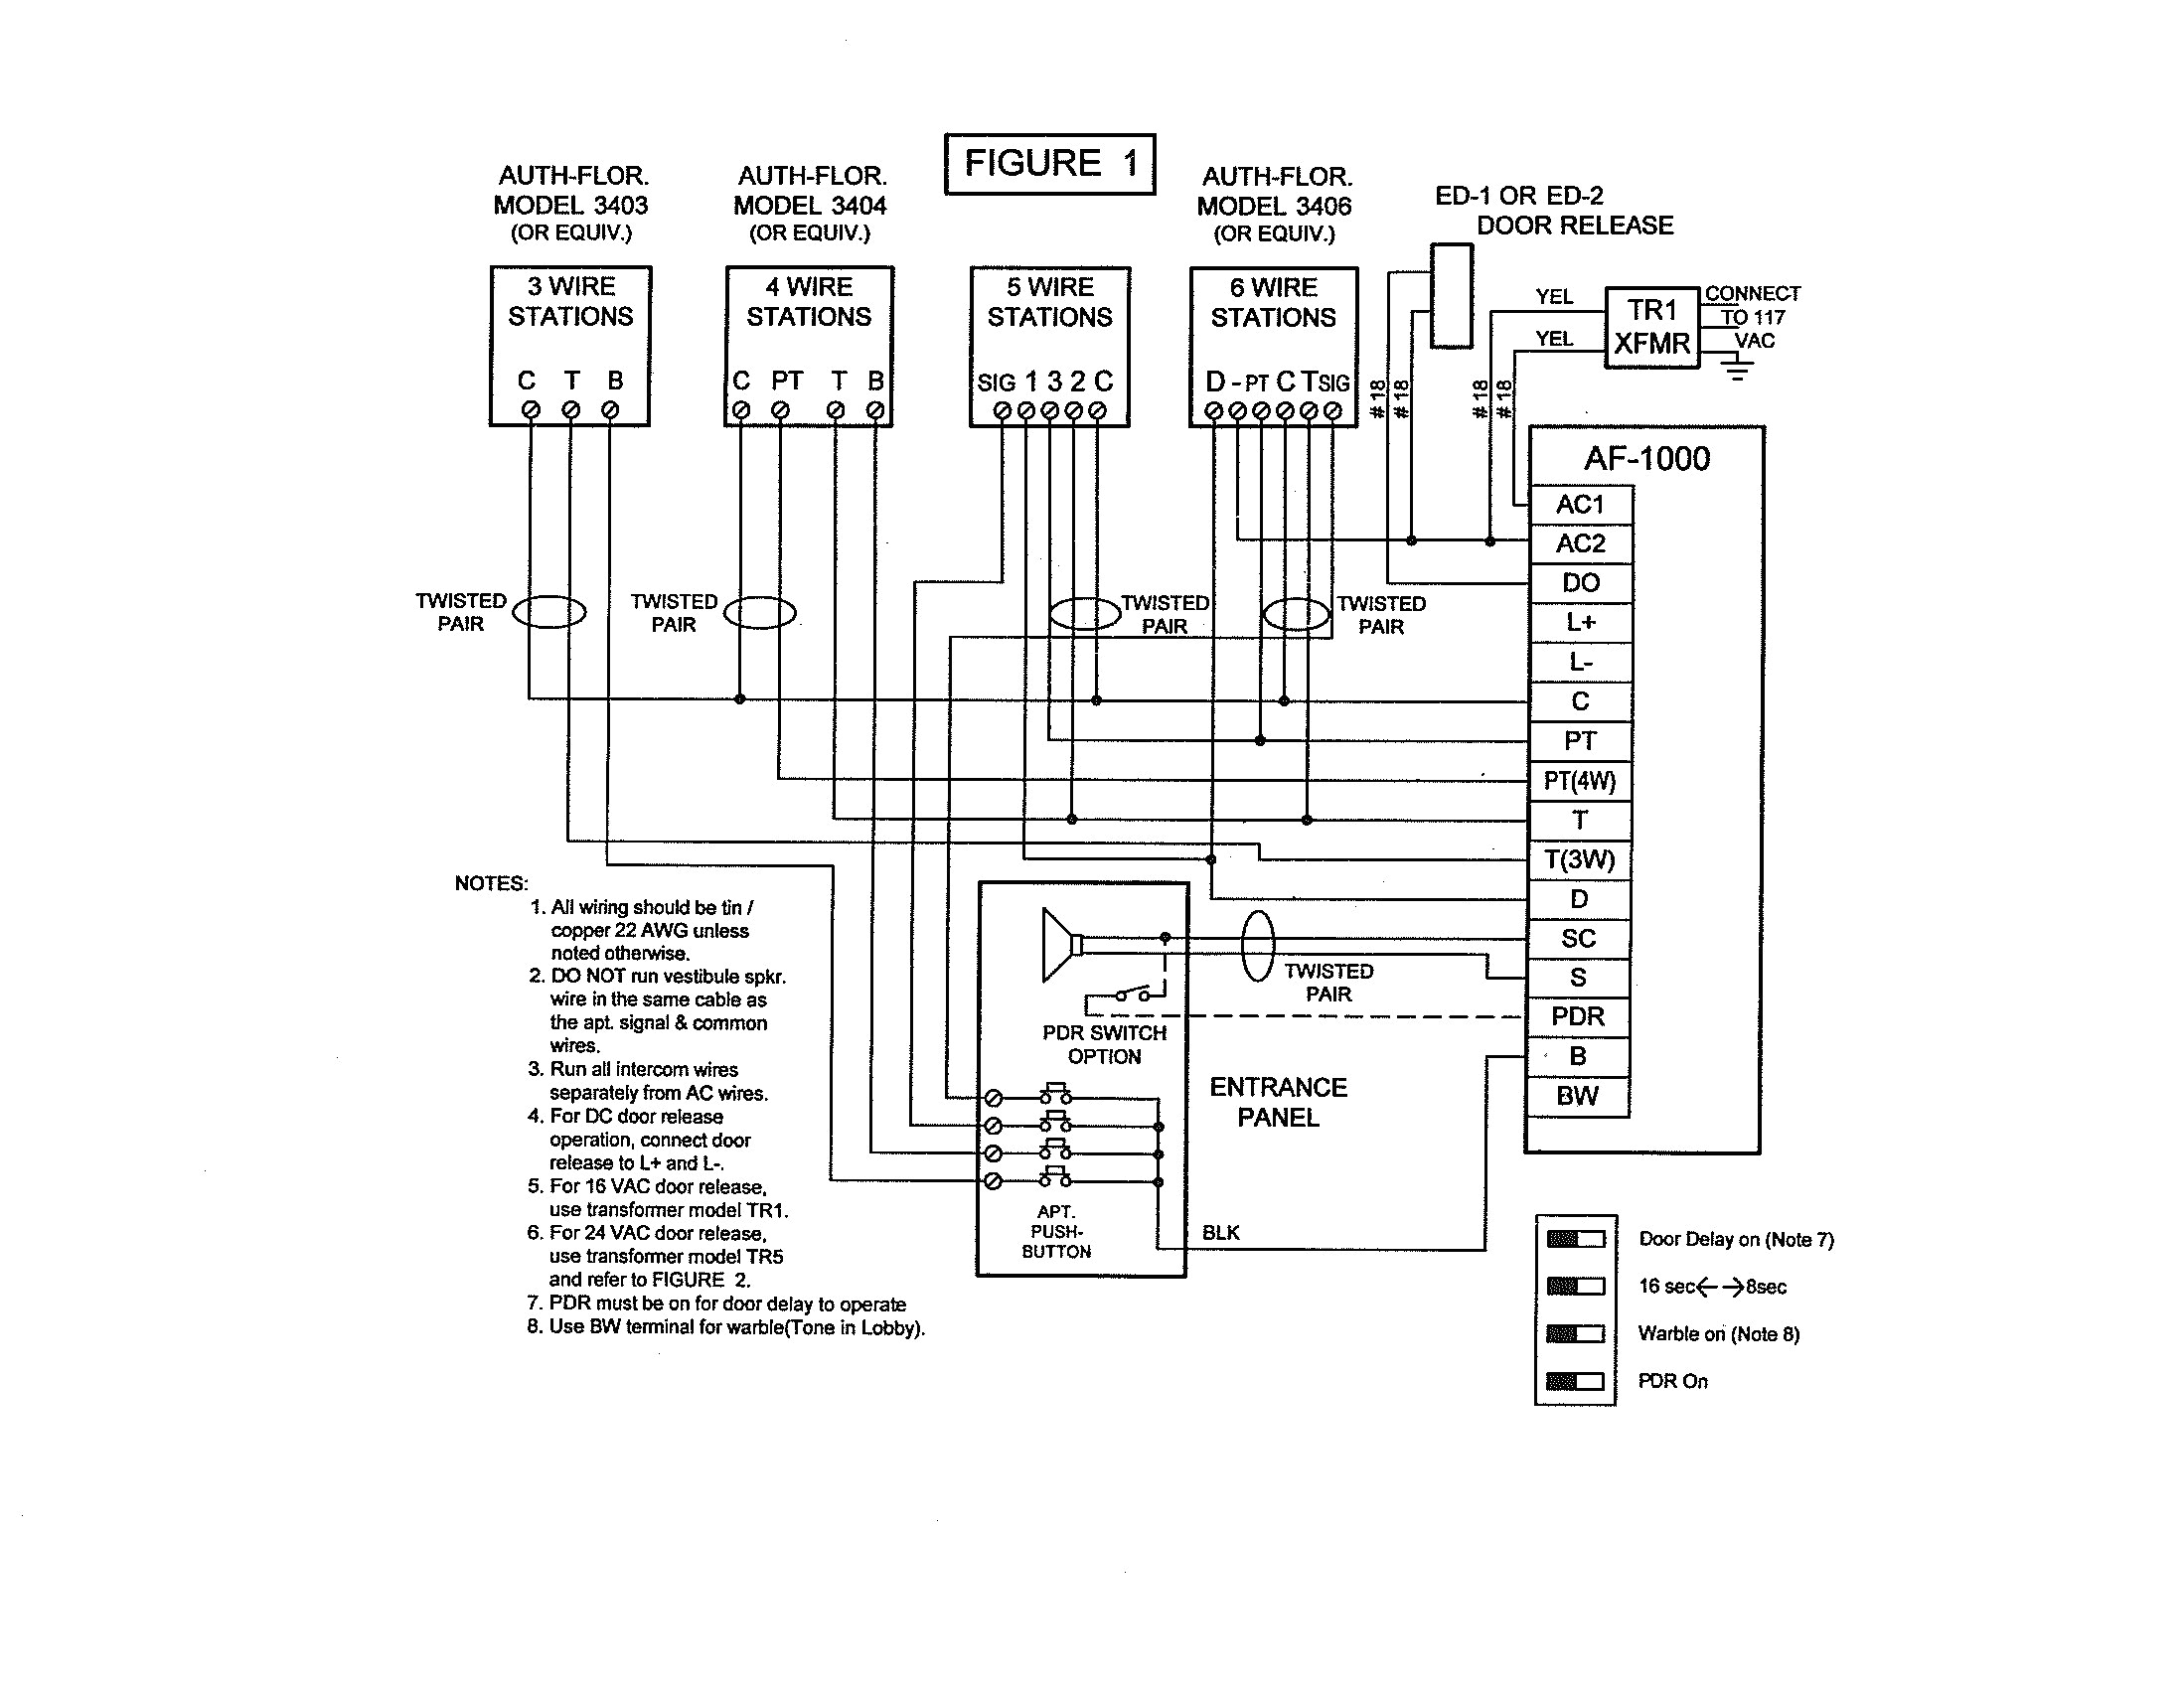 m audio wiring diagrams wiring diagram technic m audio wiring diagrams